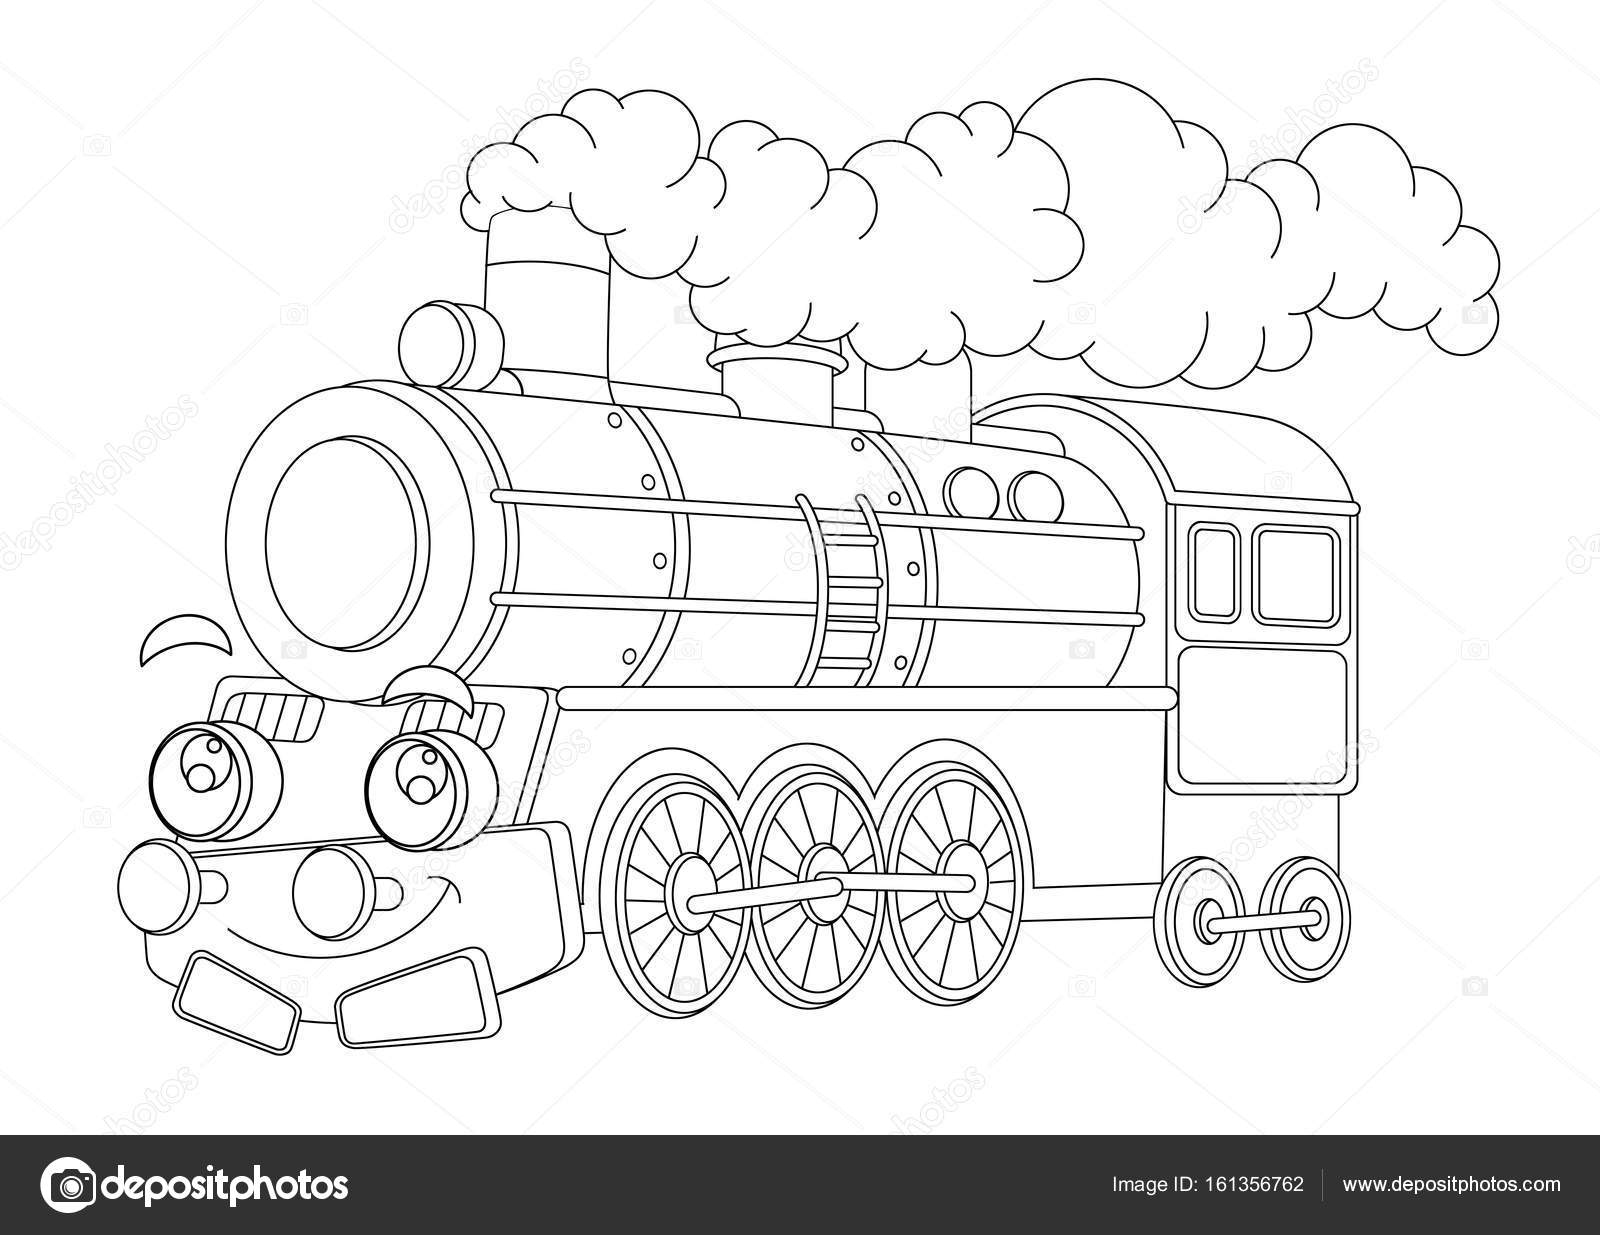 Dibujos Tren Caricatura Para Colorear Dibujos Animados Gracioso